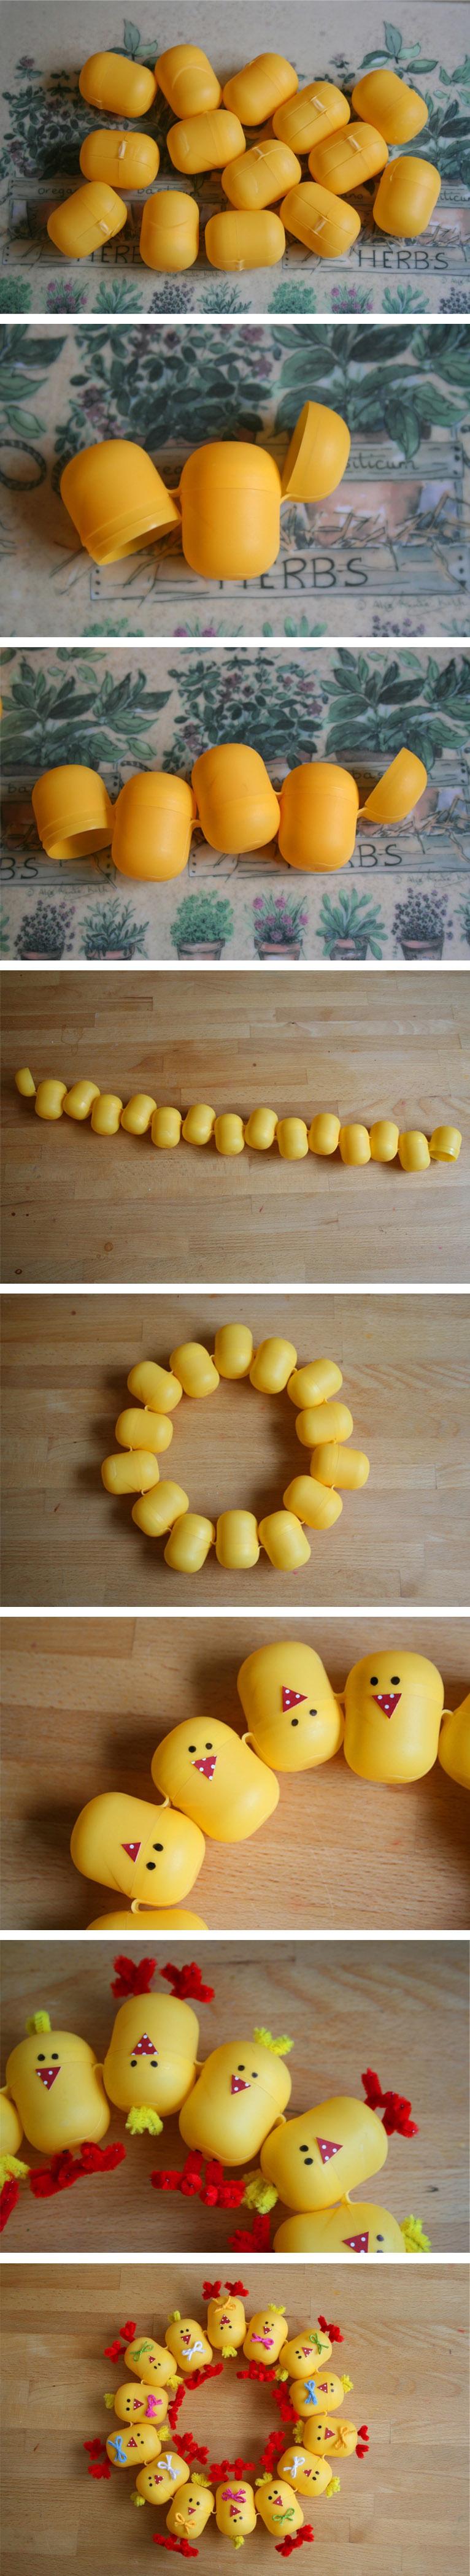 huevos-kinder-corona-diy-muy-ingenioso-1.jpg 766×4.200 piksel